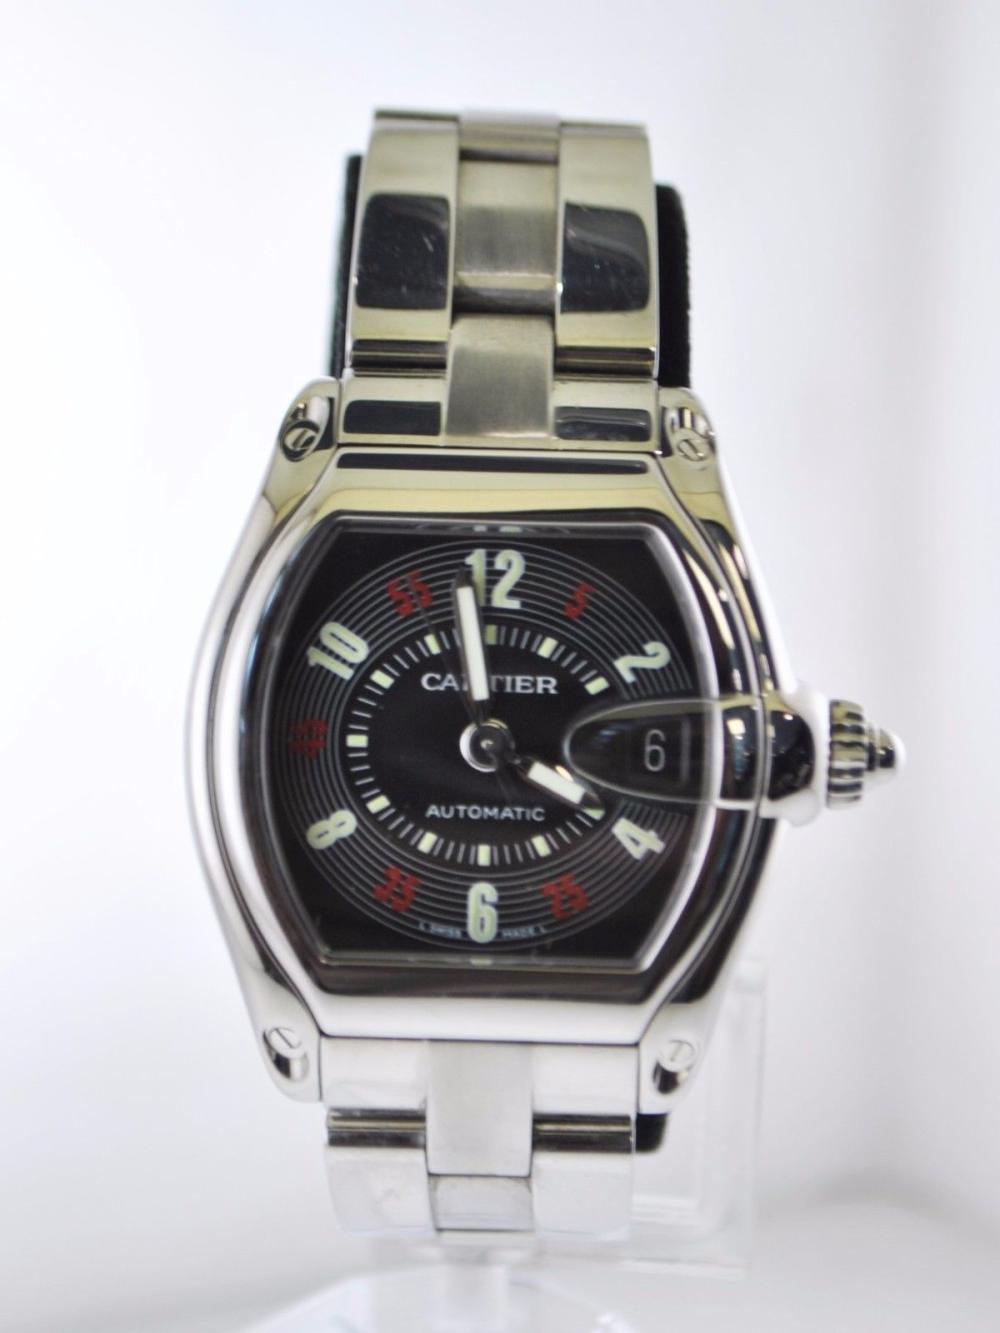 4bdc4f3a701 Cartier Roadster  2510 Automatic Wristwatch Tonneau Case Bla